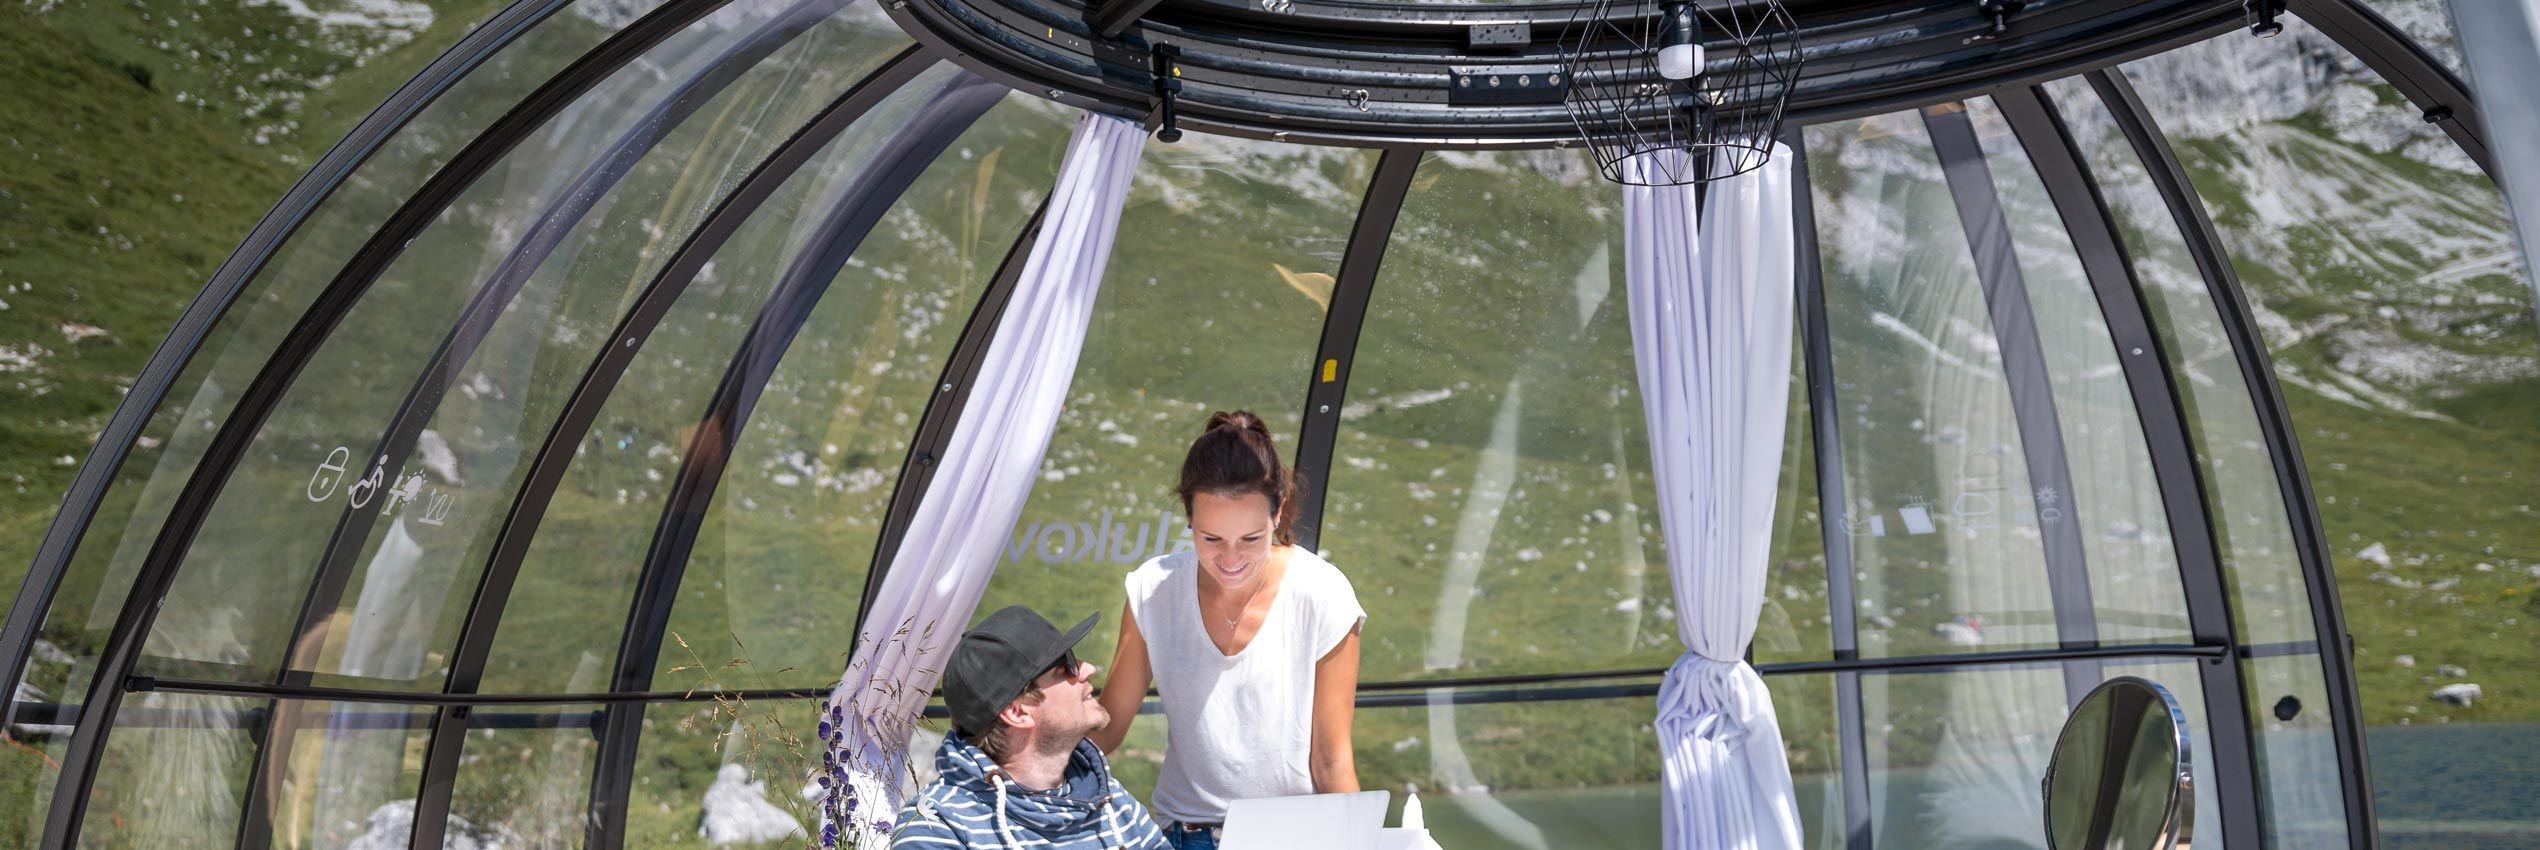 Öppet spaltak Spa Dome Orlando